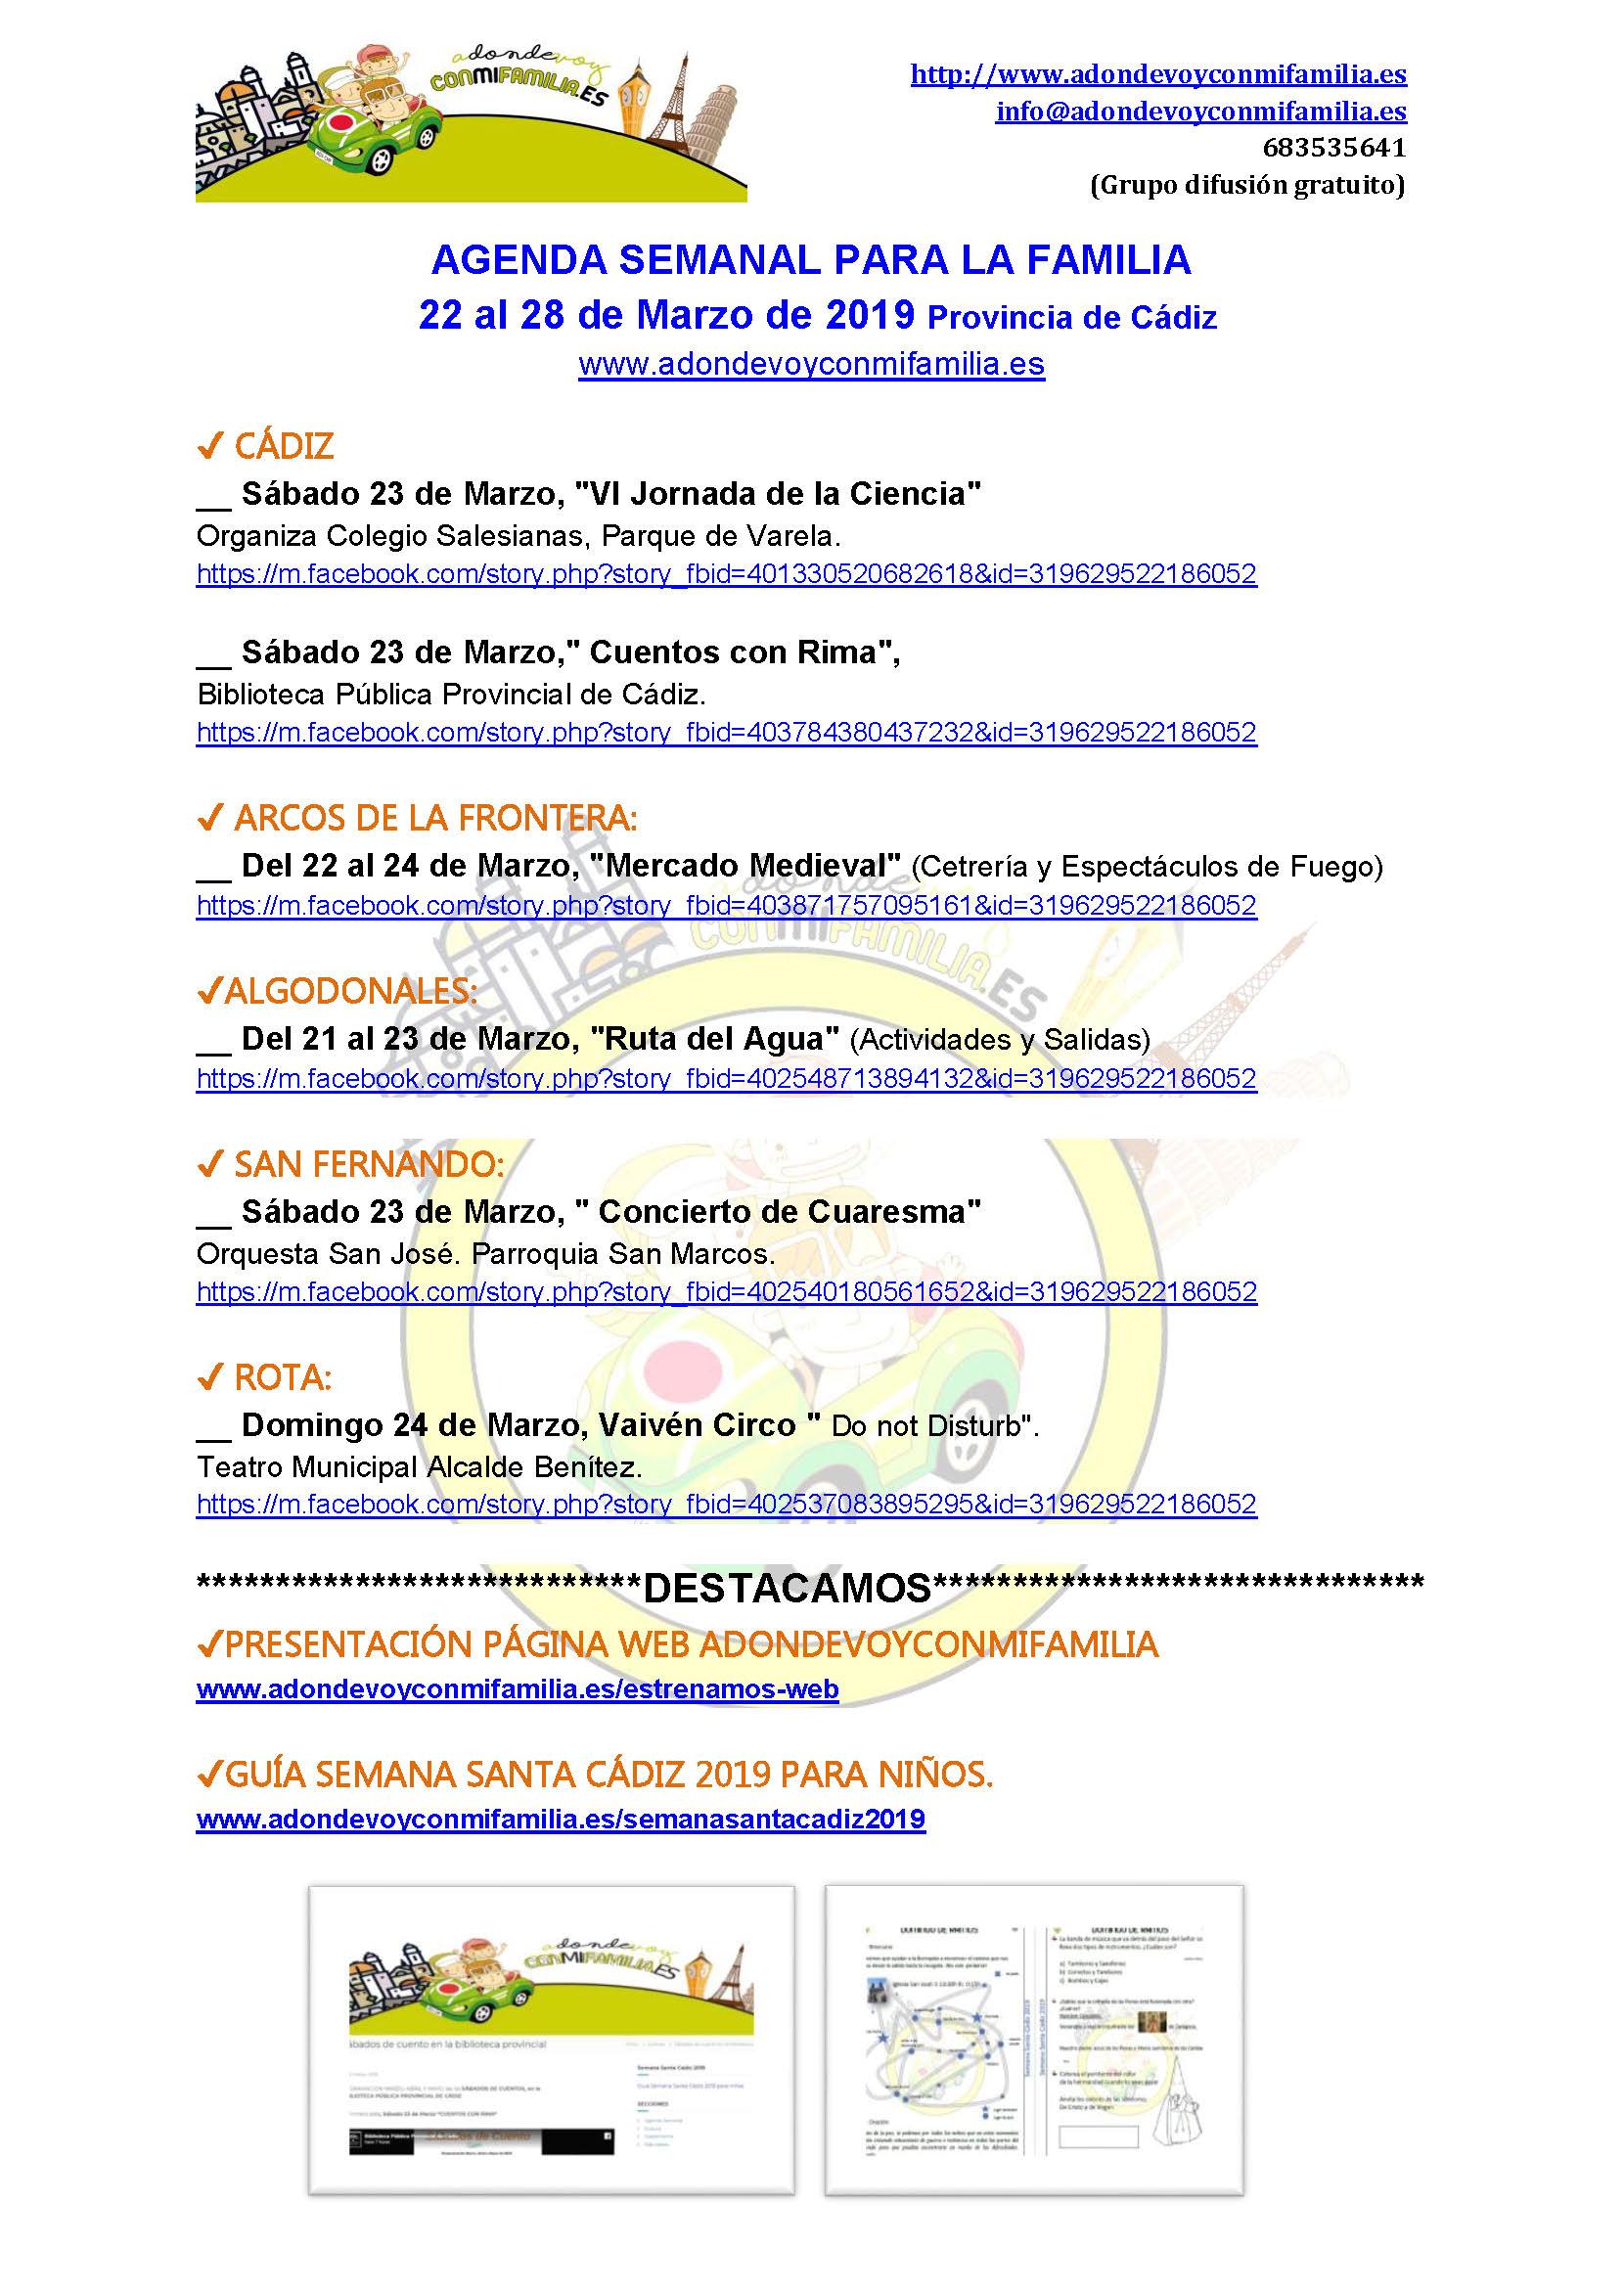 Agenda semanal familiar 22 al 28 marzo 2019 provincia Cadiz Adondevoyconmifamilia